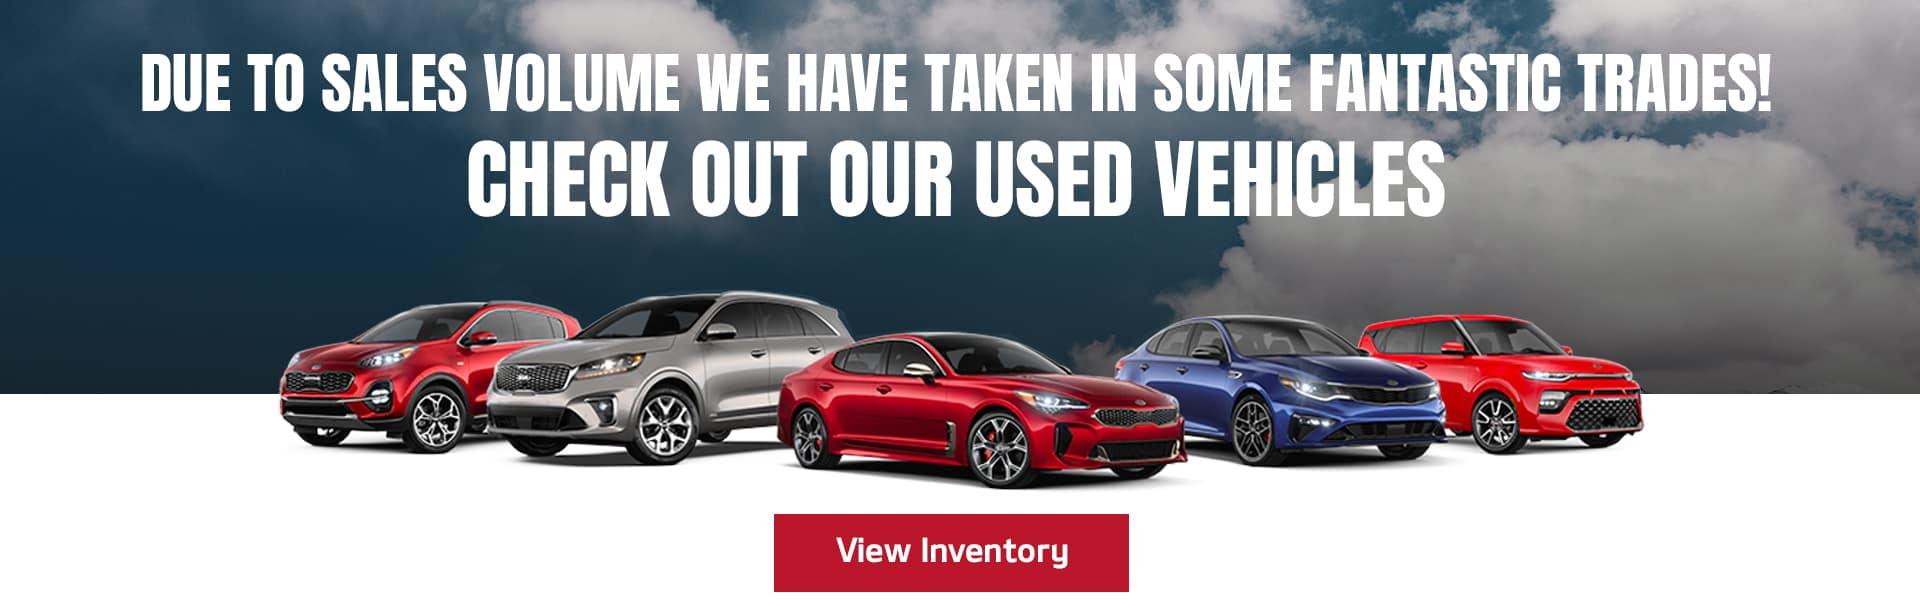 https://www.renaldokia.com/used-vehicles/